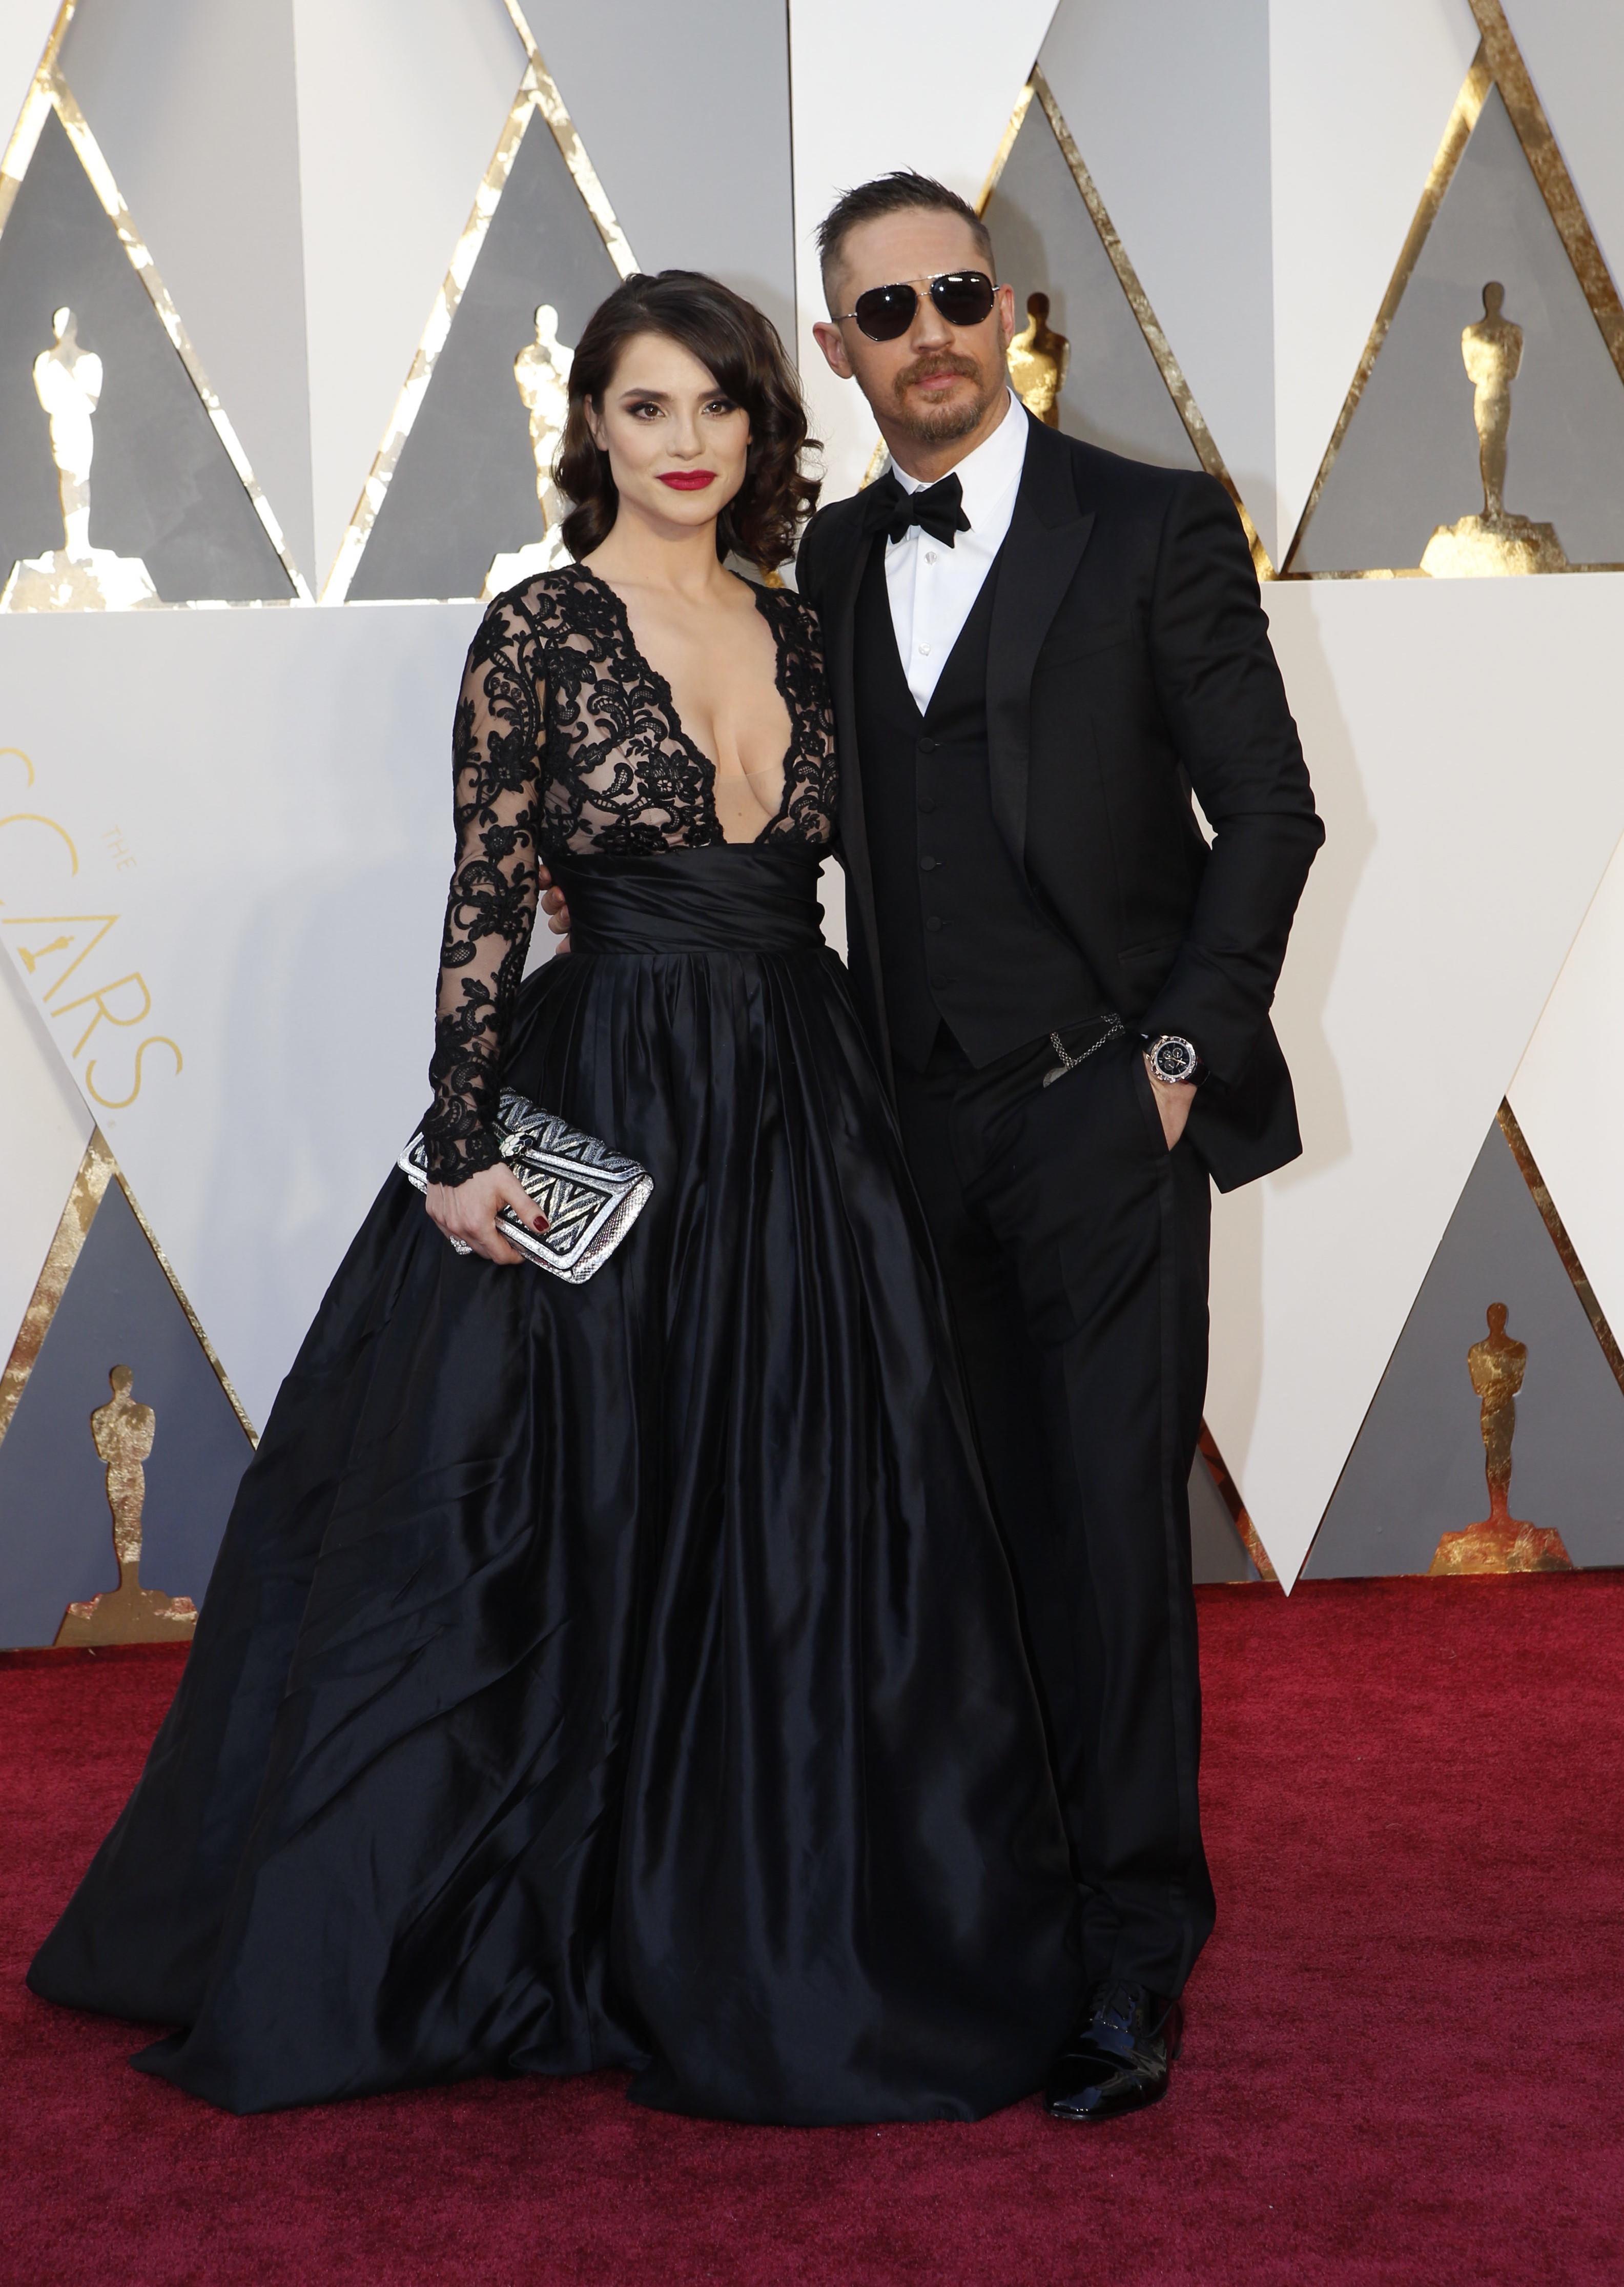 Red Carpet Couples 2016 John Legend Chrissy Teigen And